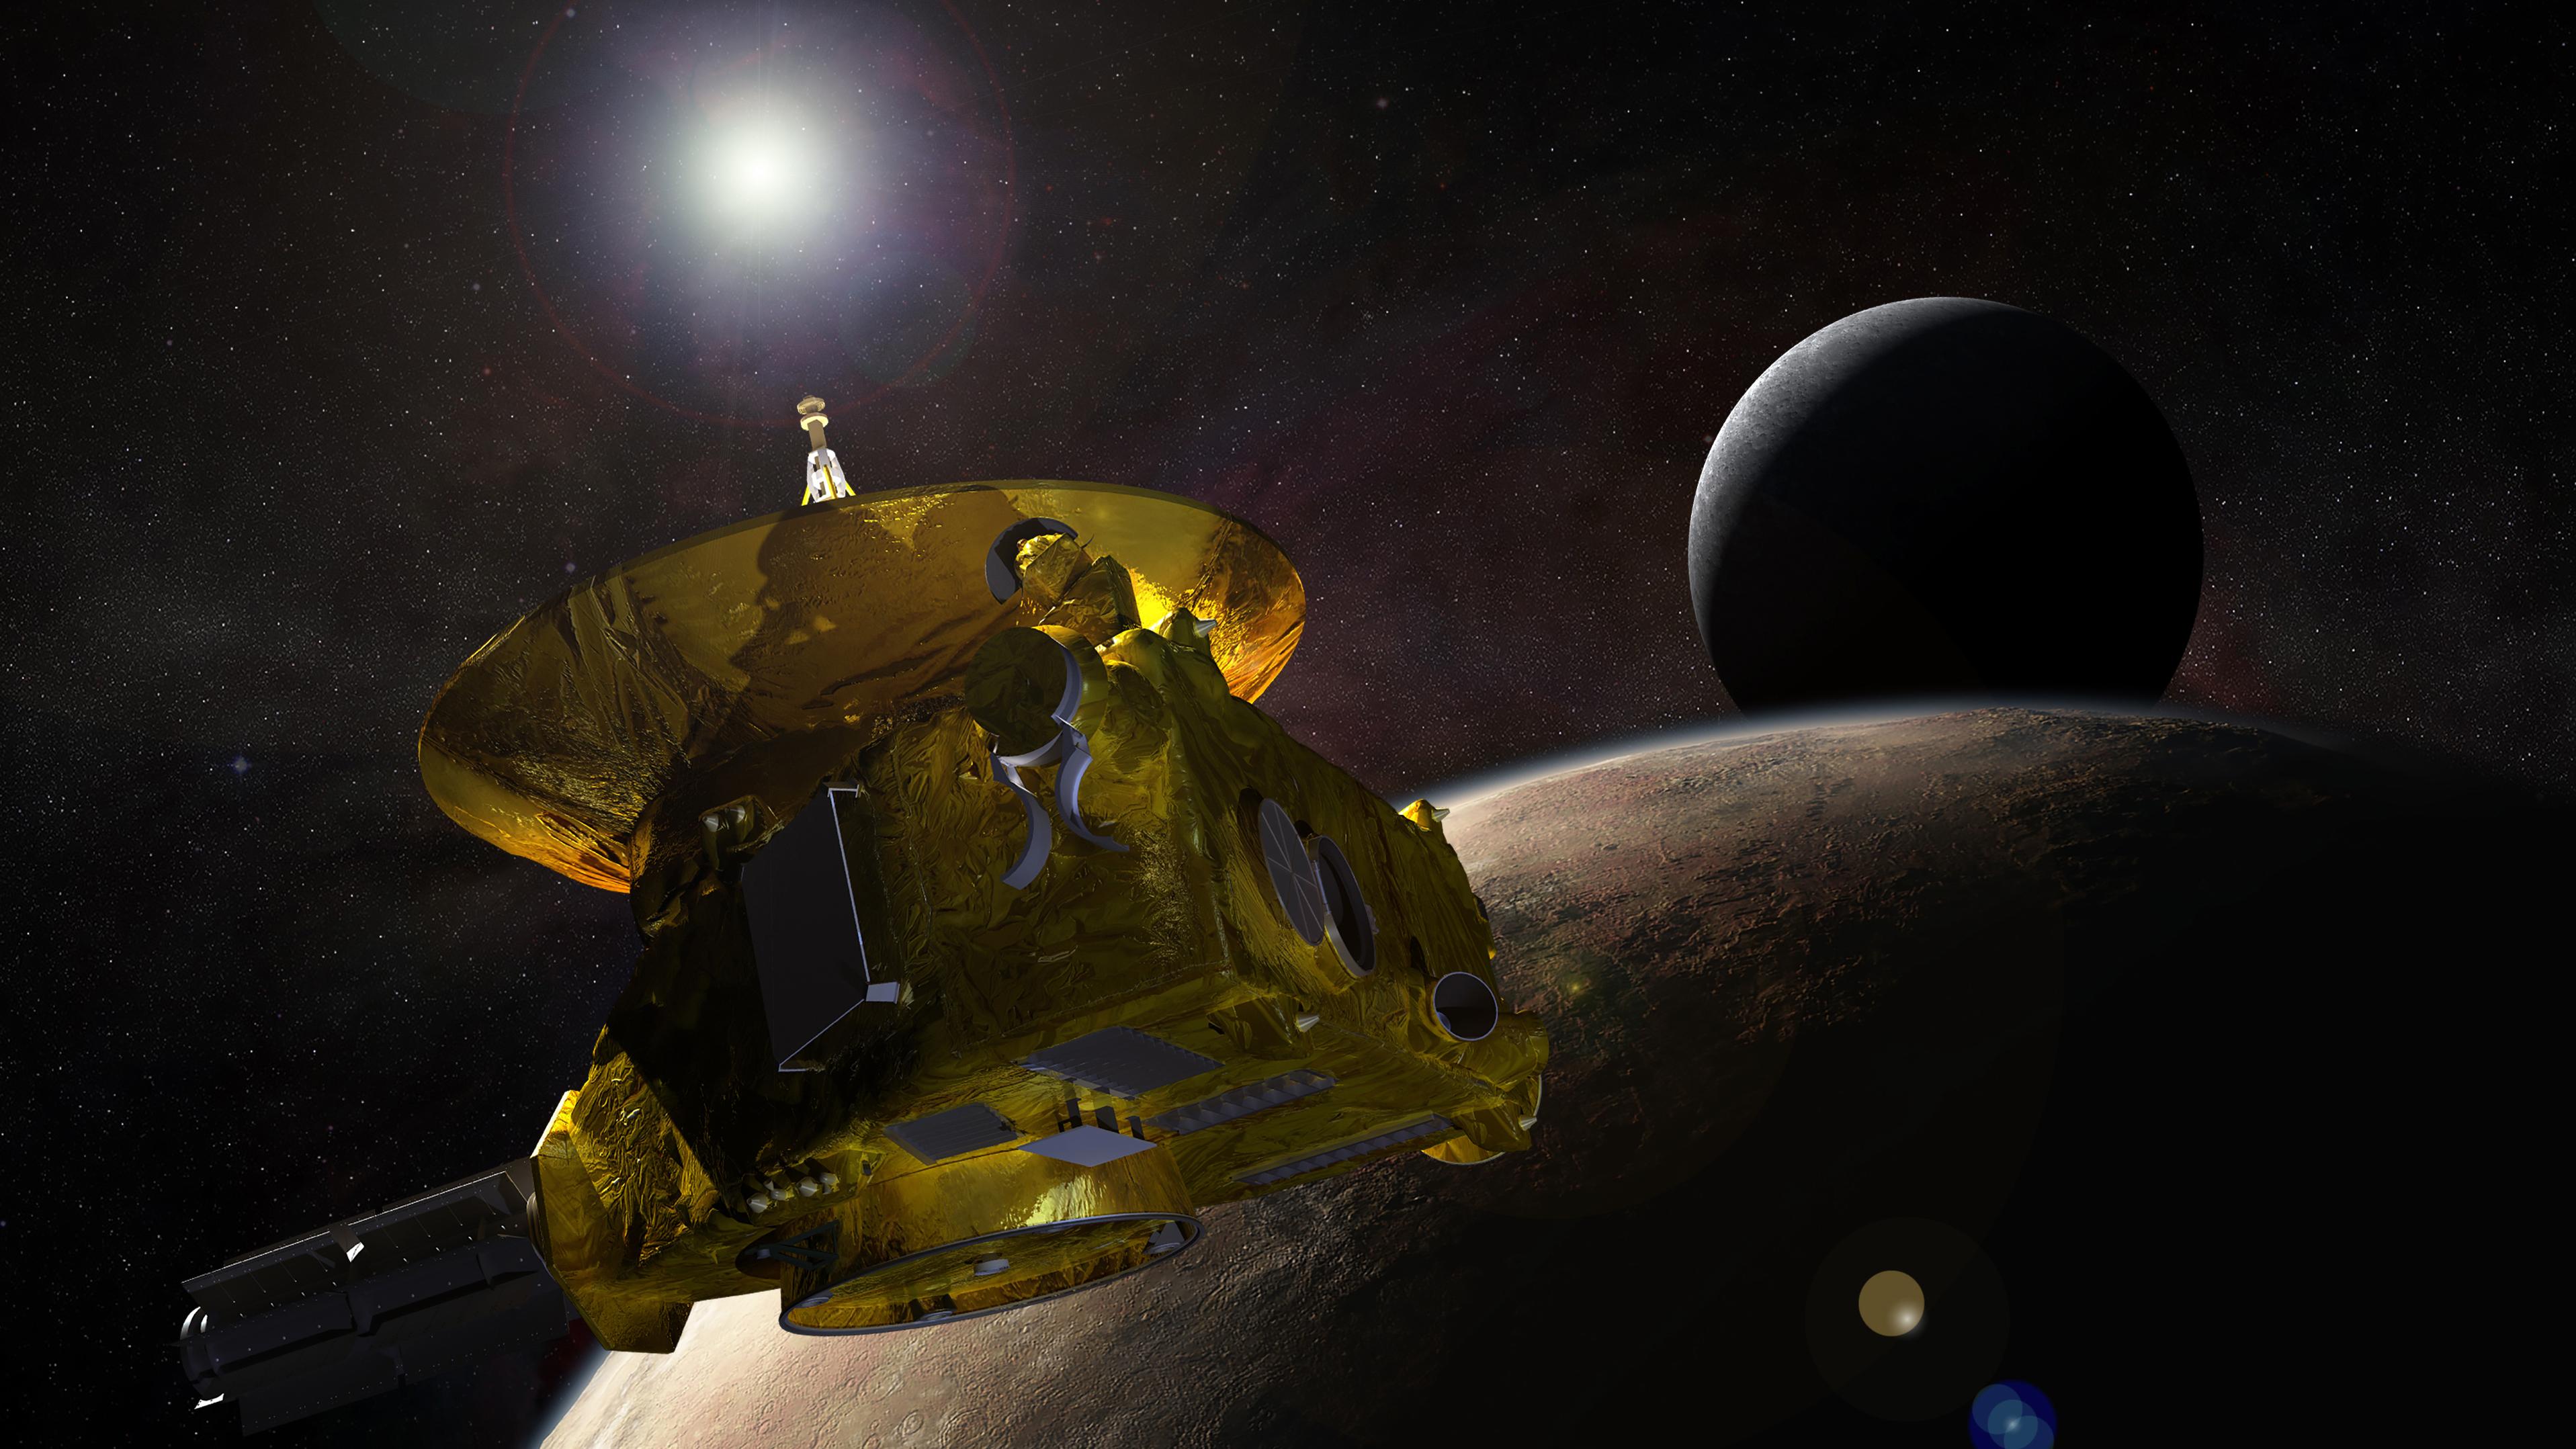 pluto spacecraft new arrival horizon - photo #23